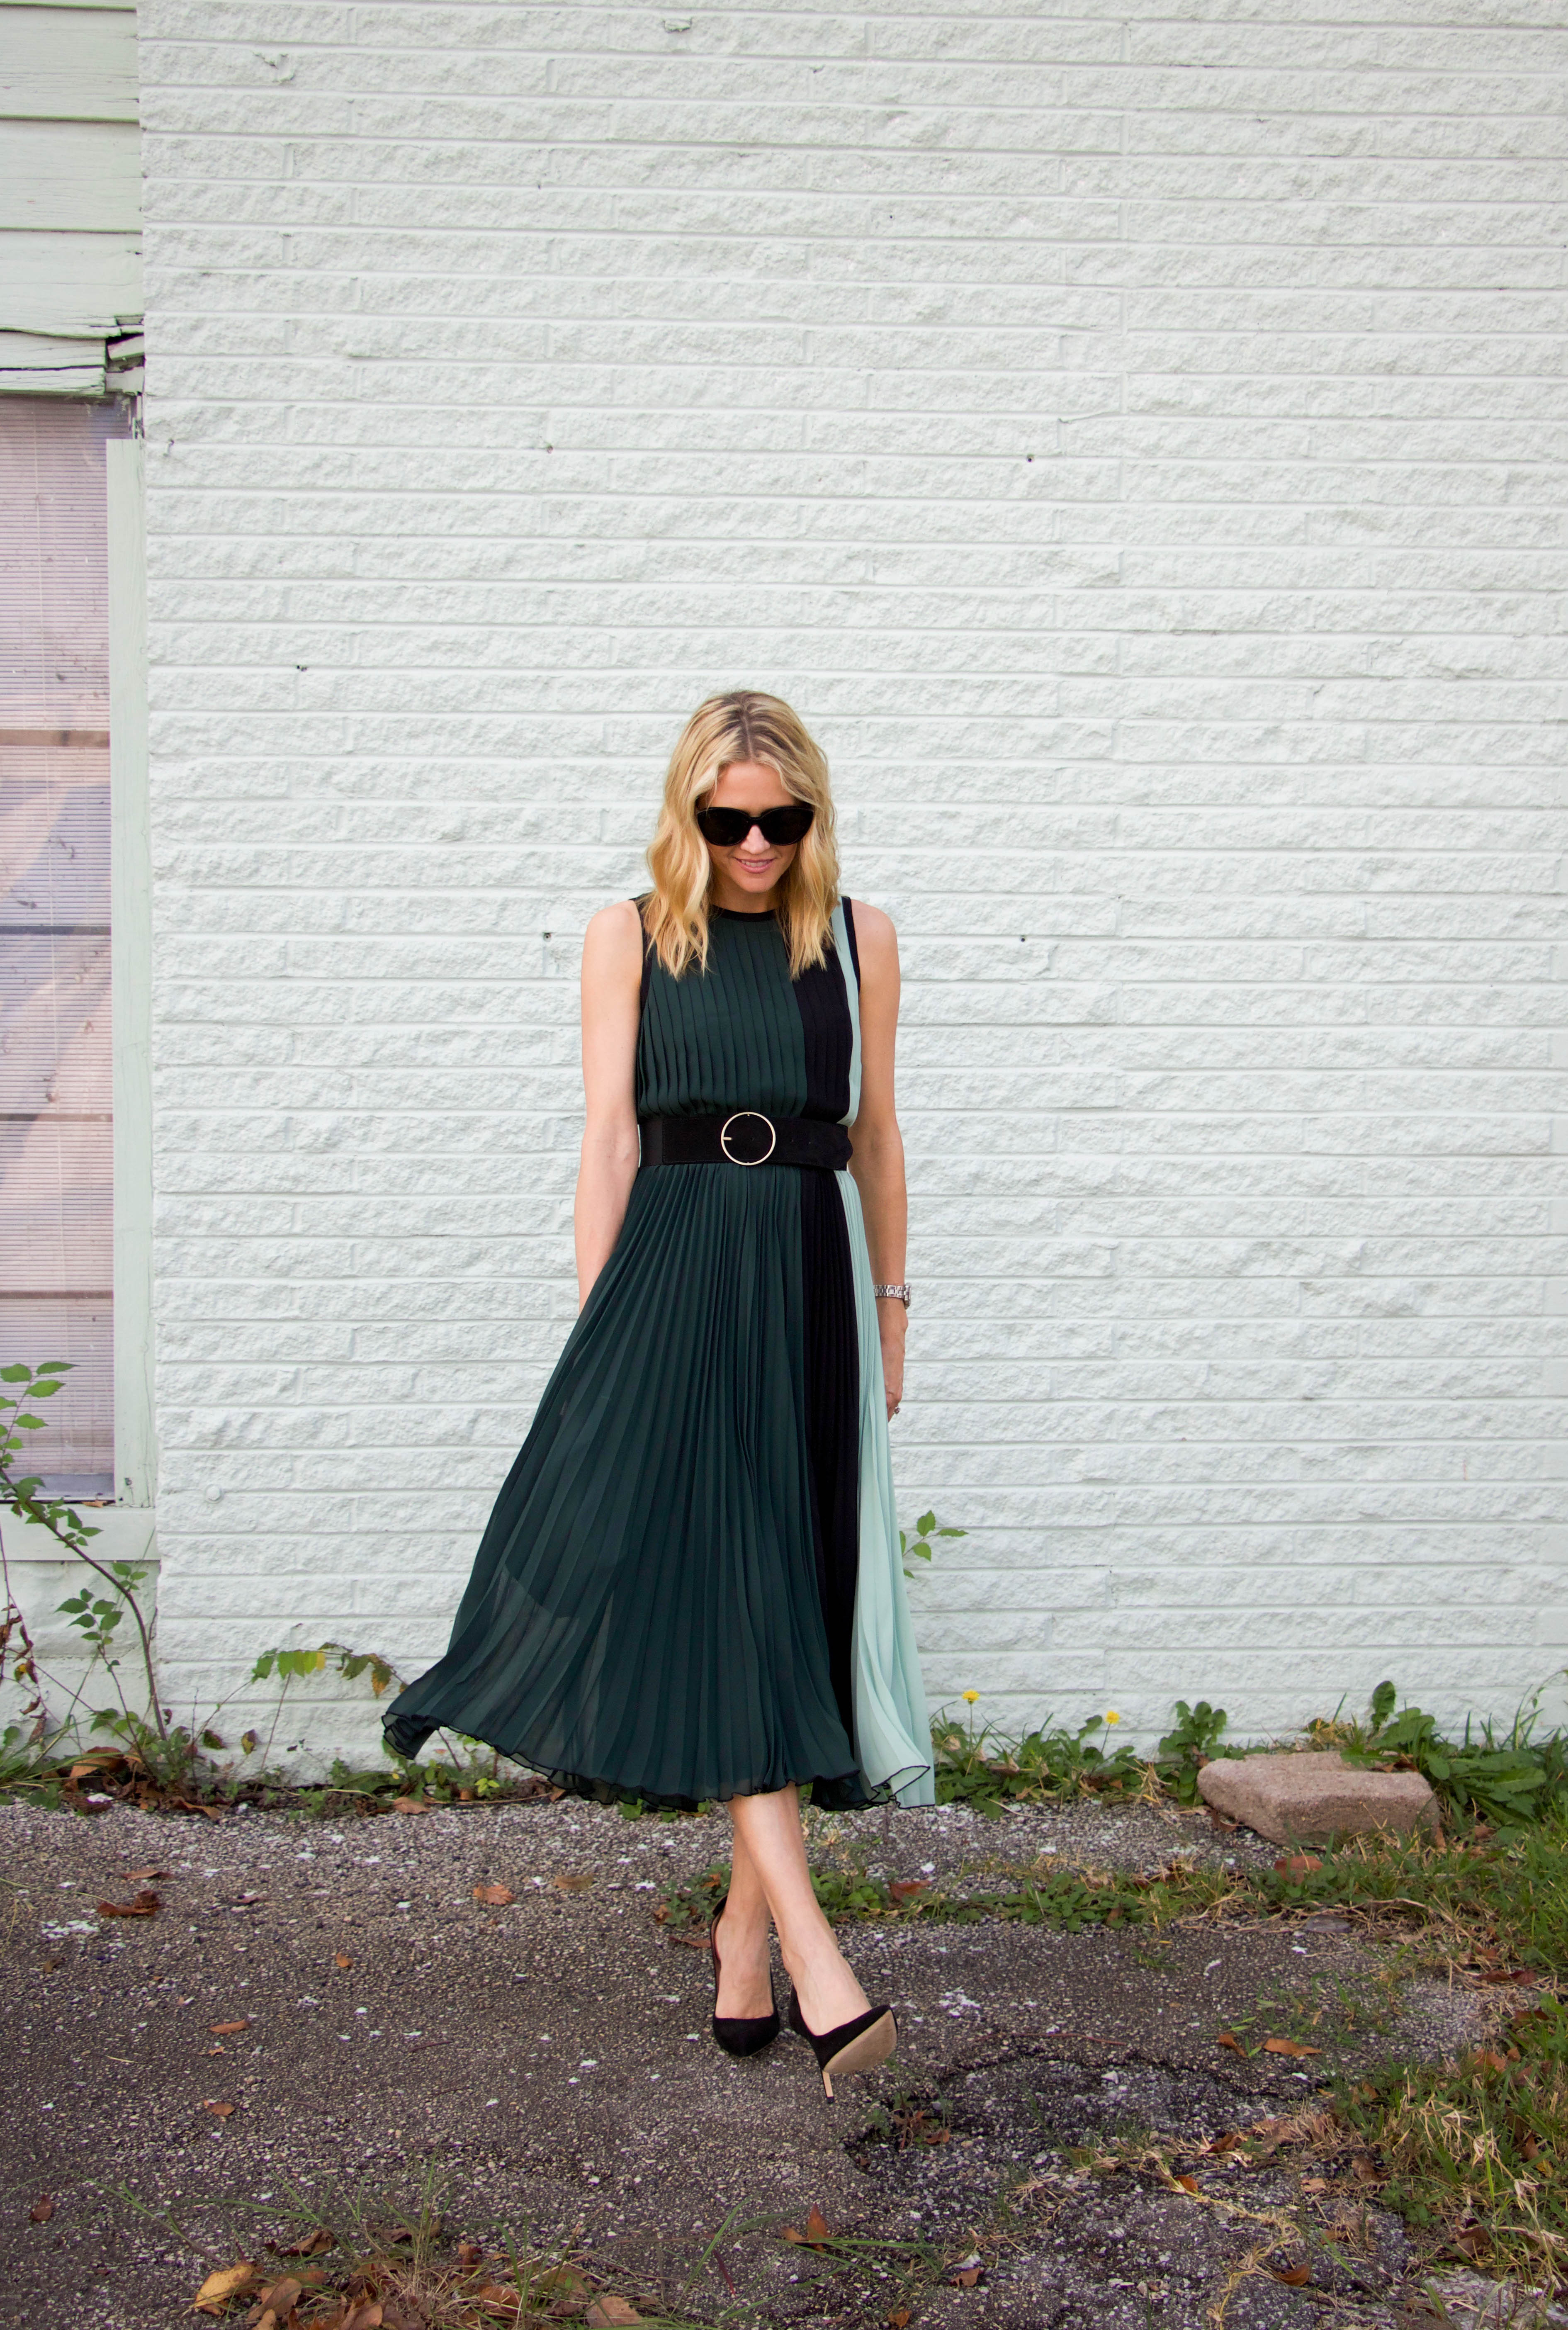 Atlantic Pacific green block dress - black pumps - silk bag - sunnies - holiday style - party dress - winter look